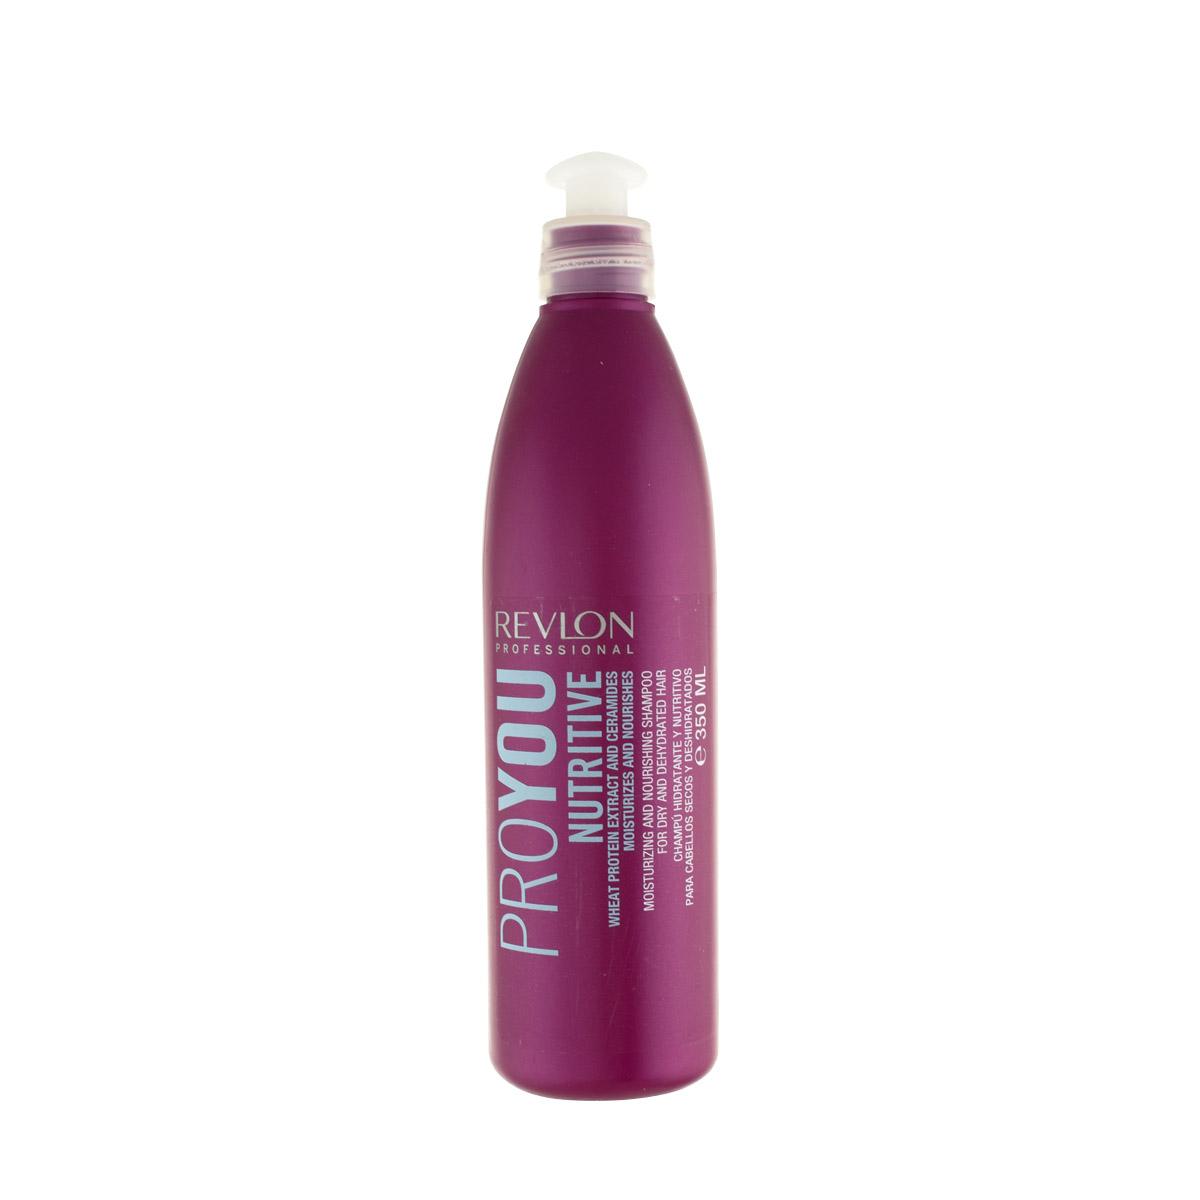 Revlon Professional Pro You Hydro-Nutritive Shampoo 350 ml